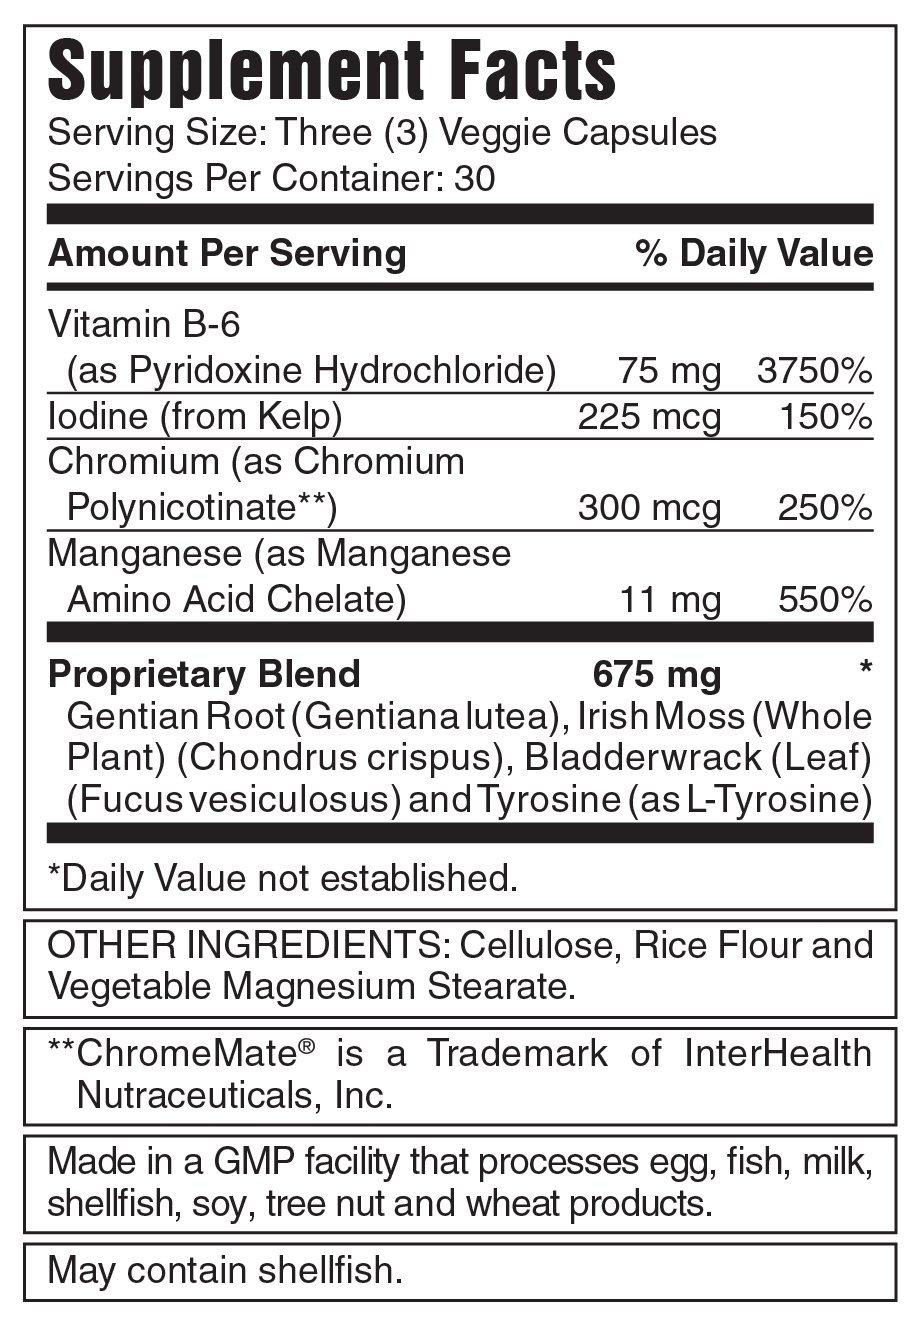 Myotropic Innovations Thyrokinetix - Natural Thyroid Support Supplement, Promotes Metabolism & Energy - Vegetarian, Gluten-Free, Kosher - 90 Vegan Capsules, 30 Servings